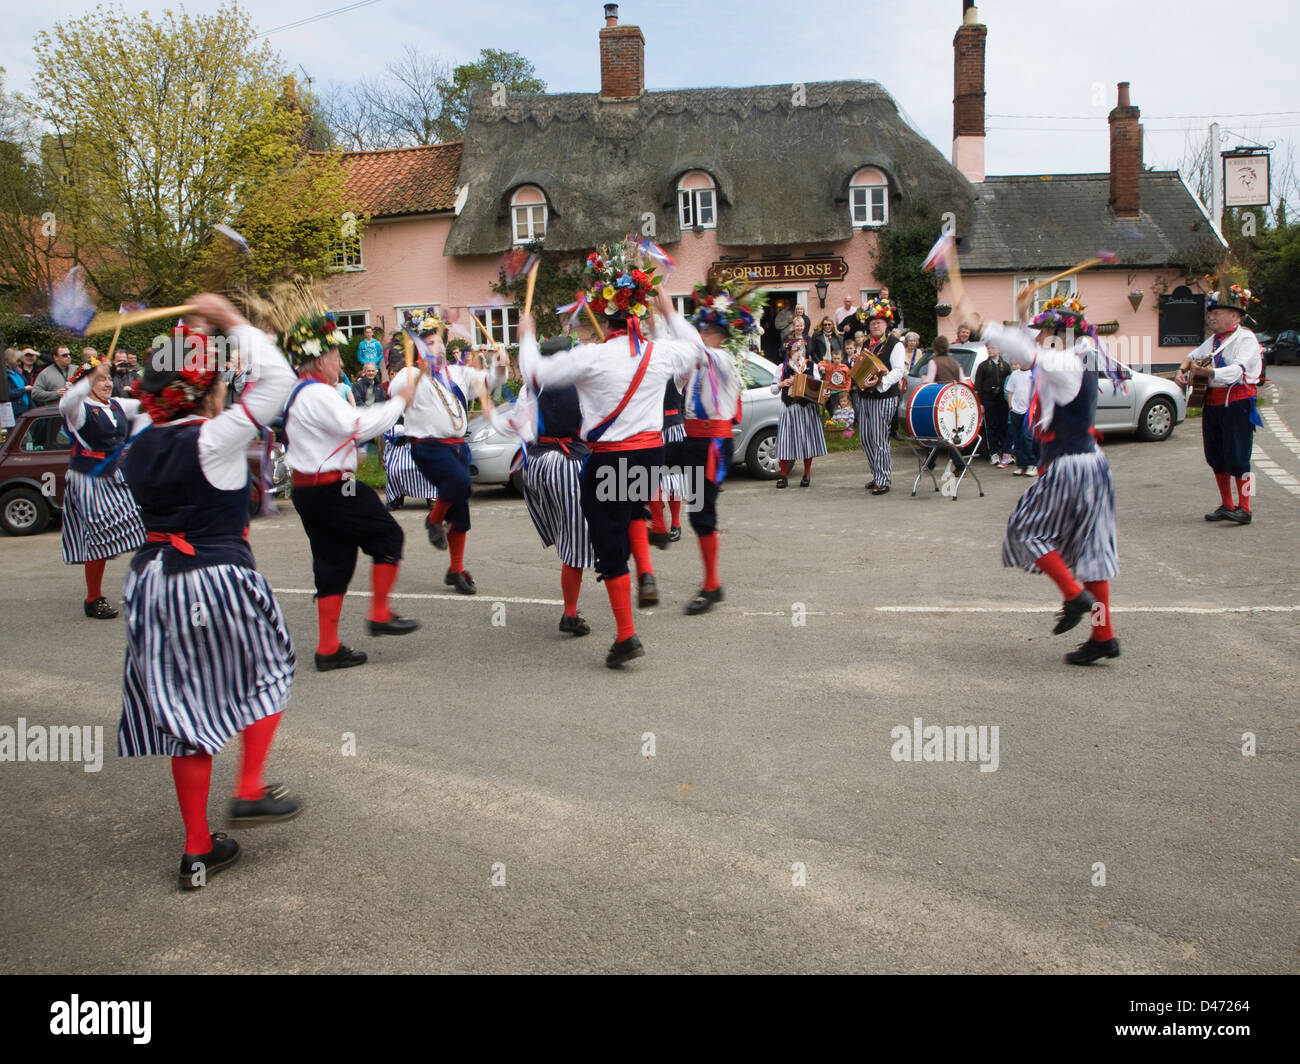 Morris dancing in country village Shottisham, Suffolk, England - Stock Image